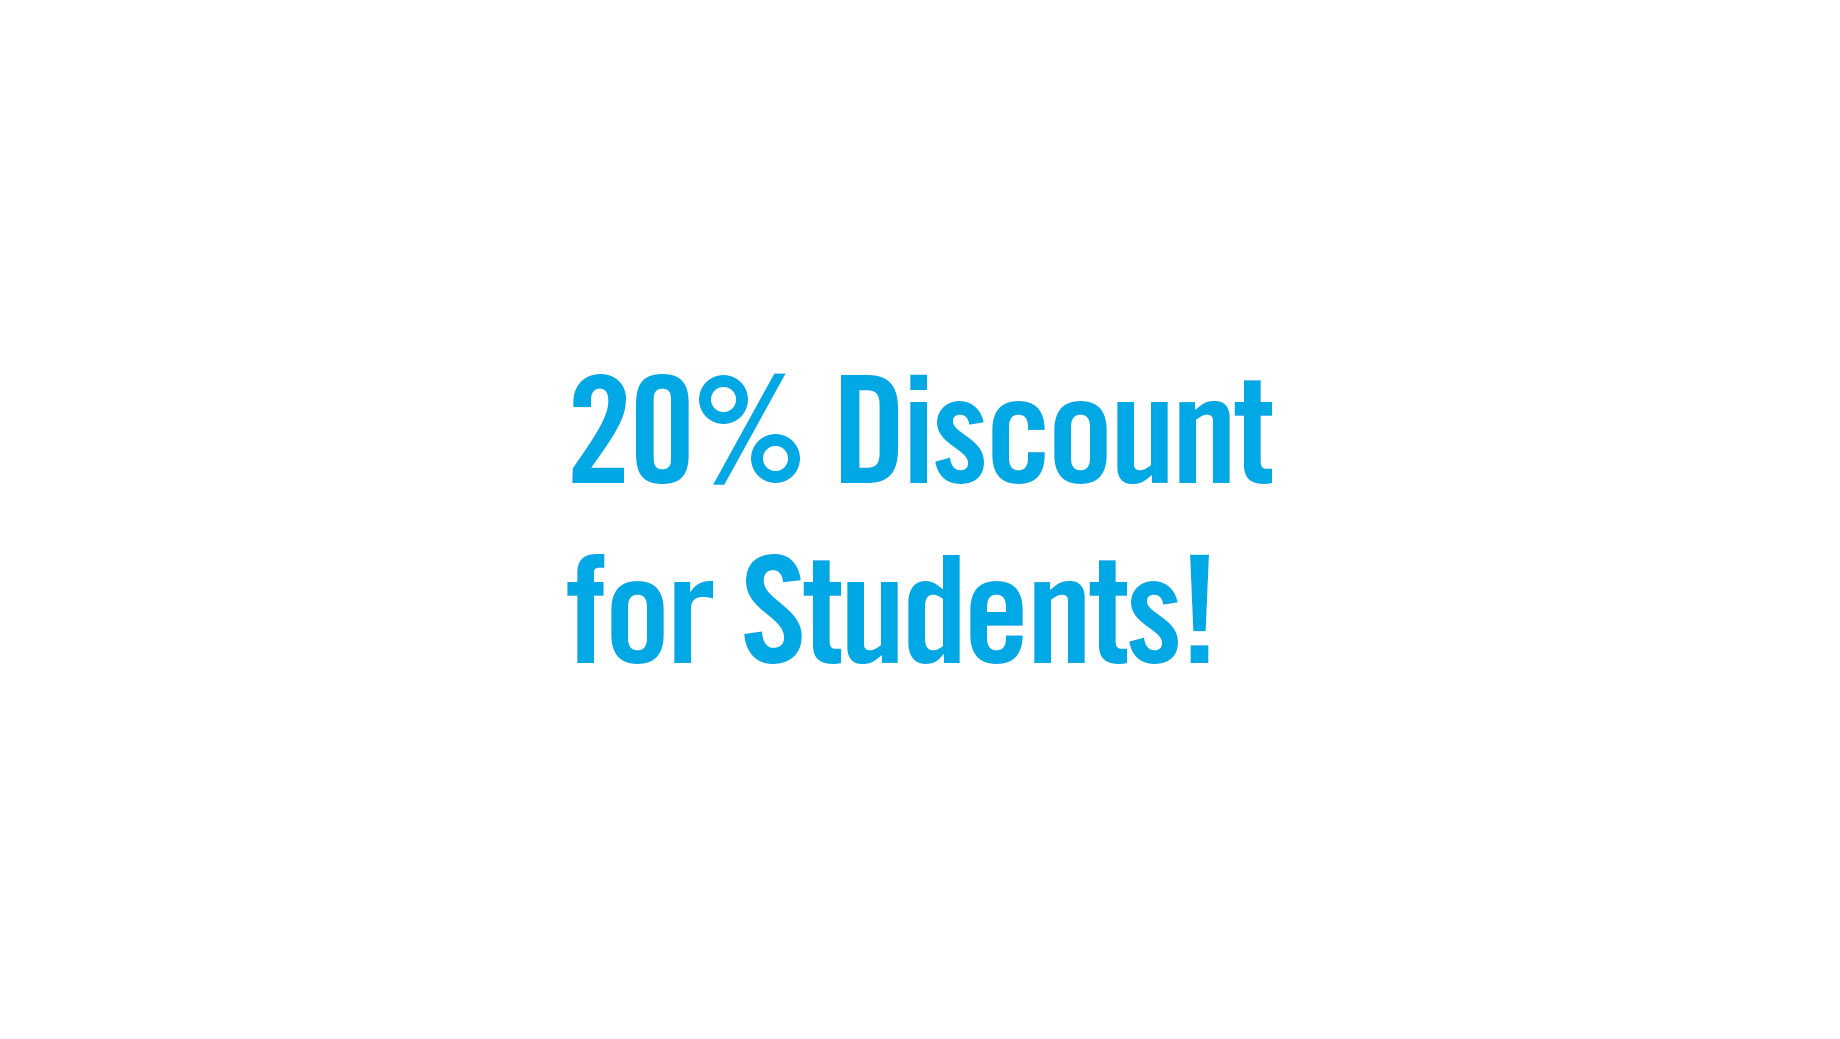 student discount.jpg